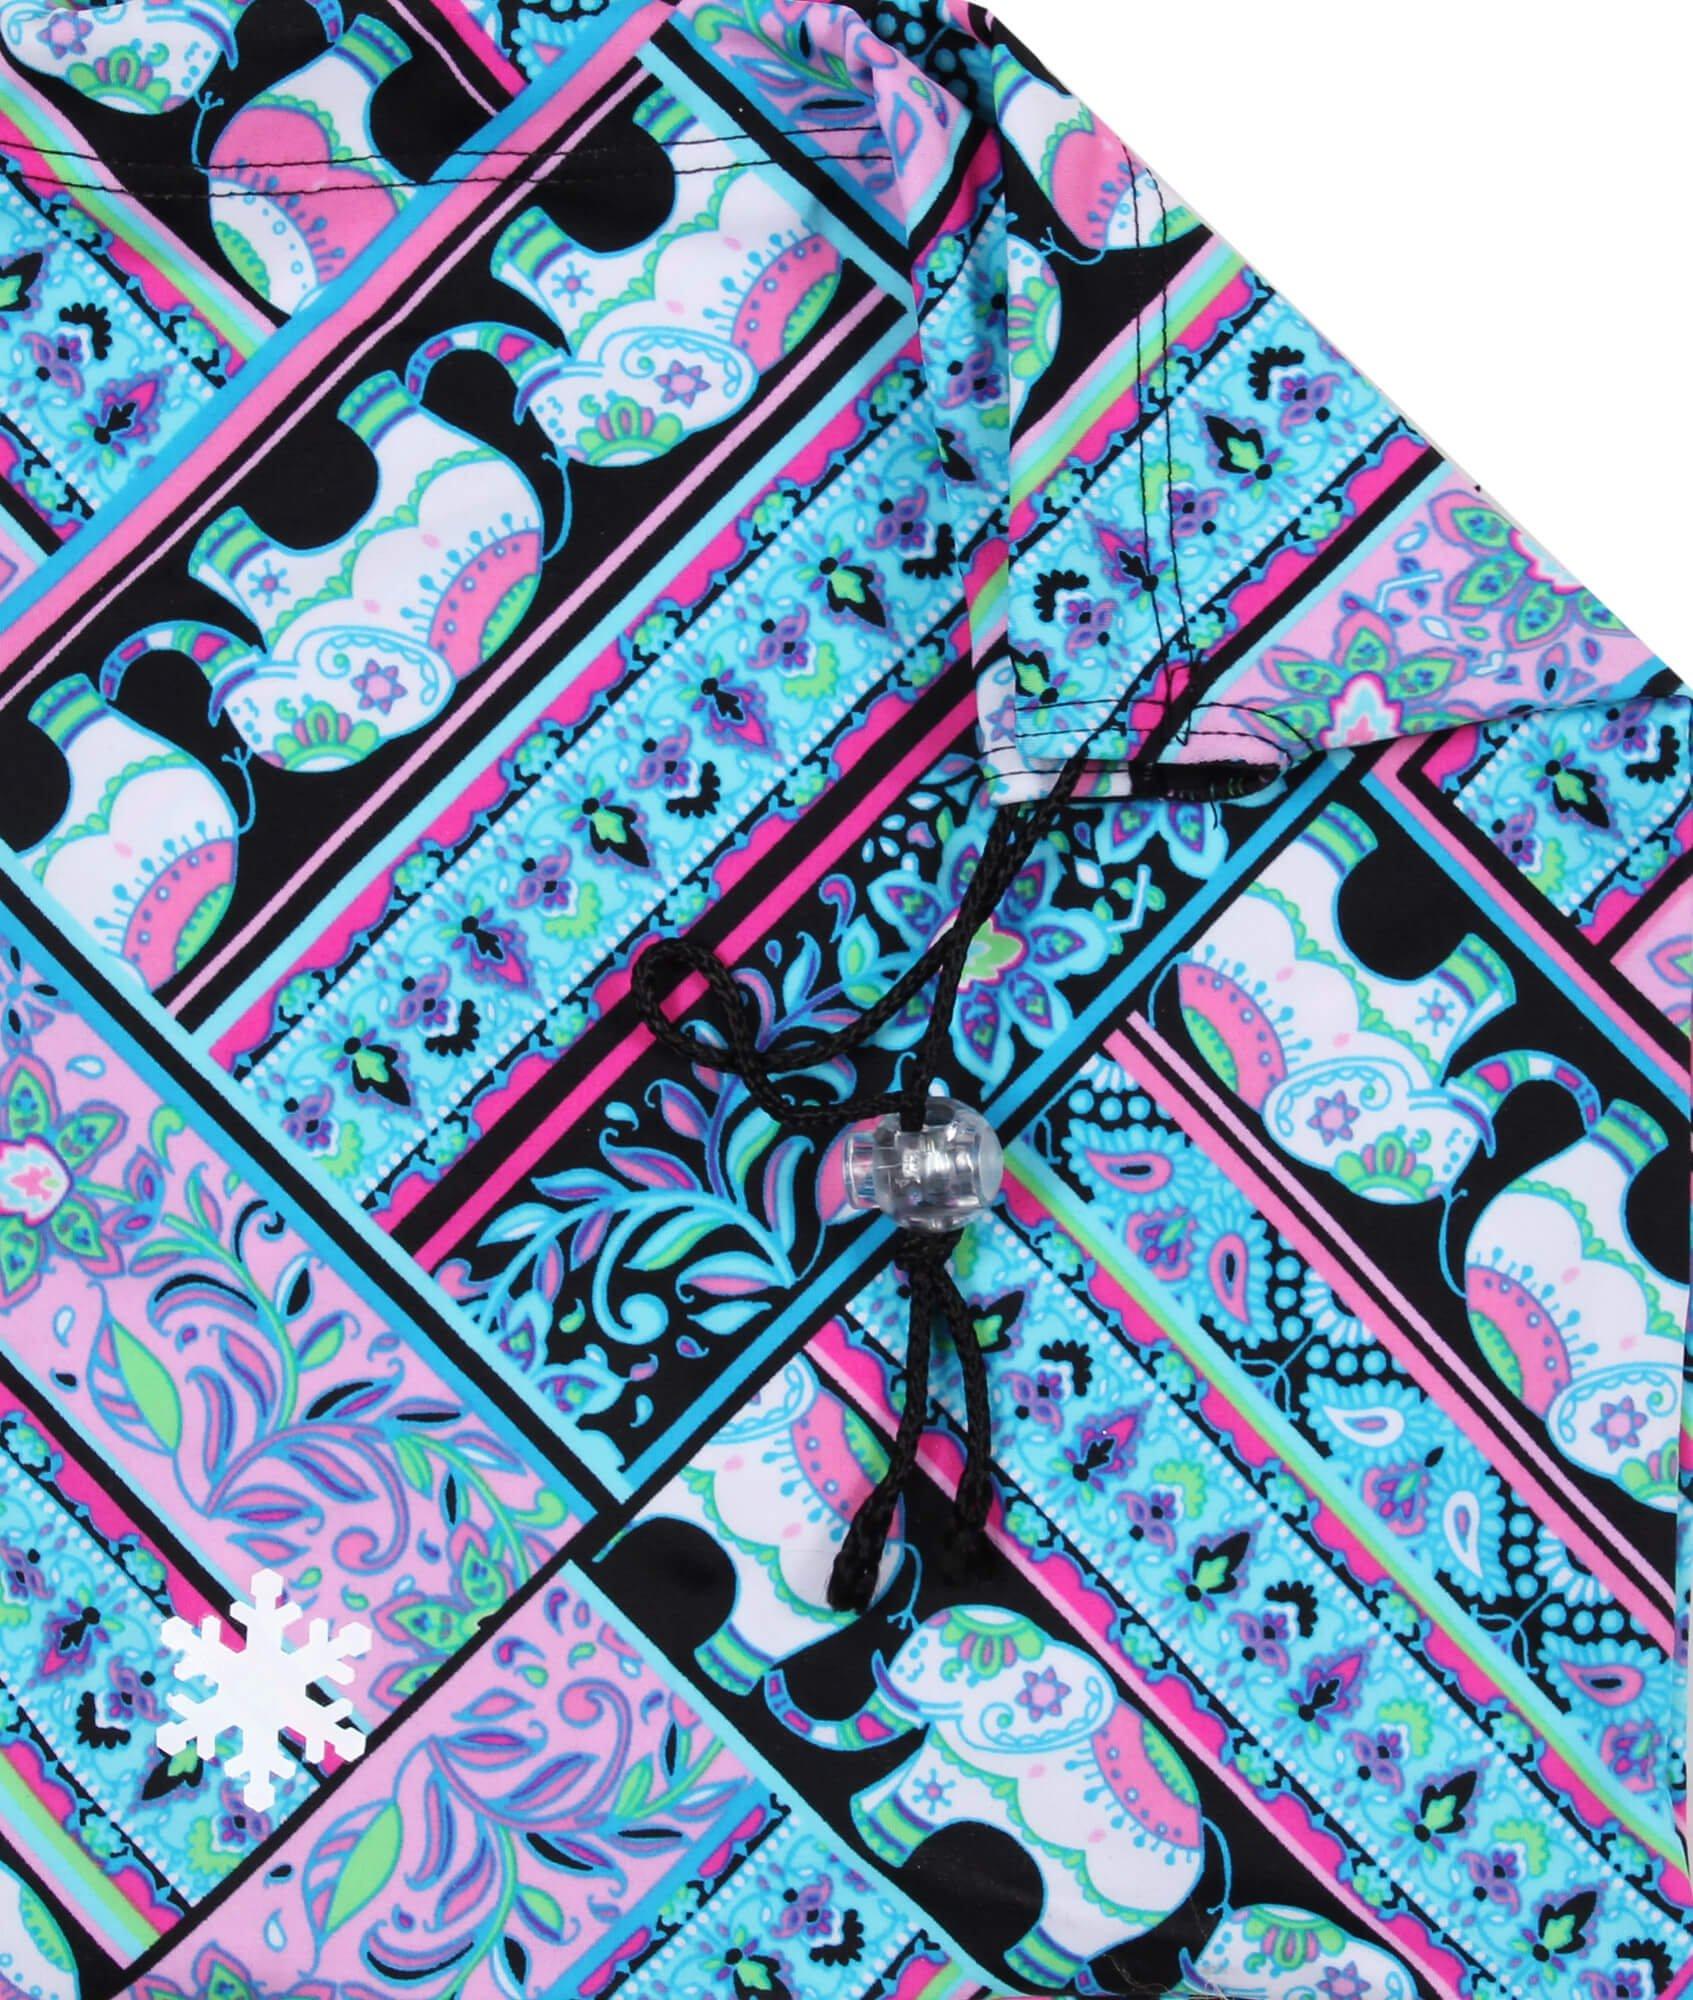 Snowflake Designs Elephant Gymnastics Grip Bag by Snowflake Designs (Image #1)